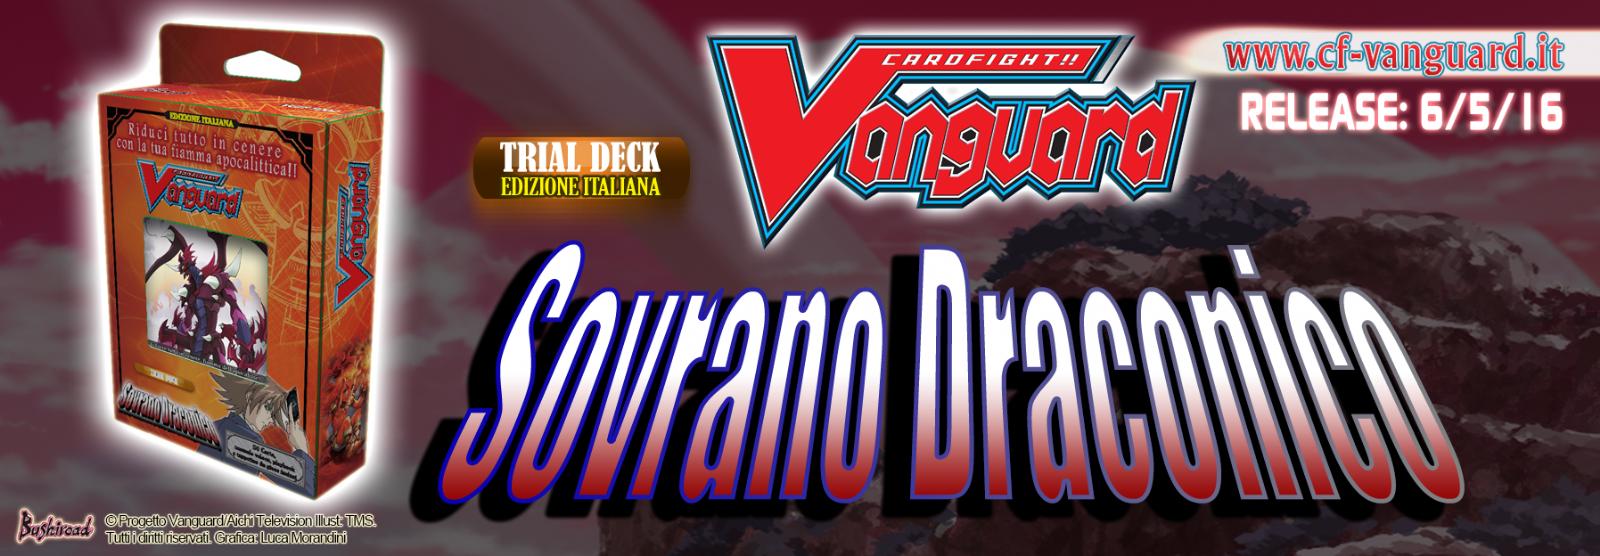 TD02 - Sovrano Draconico